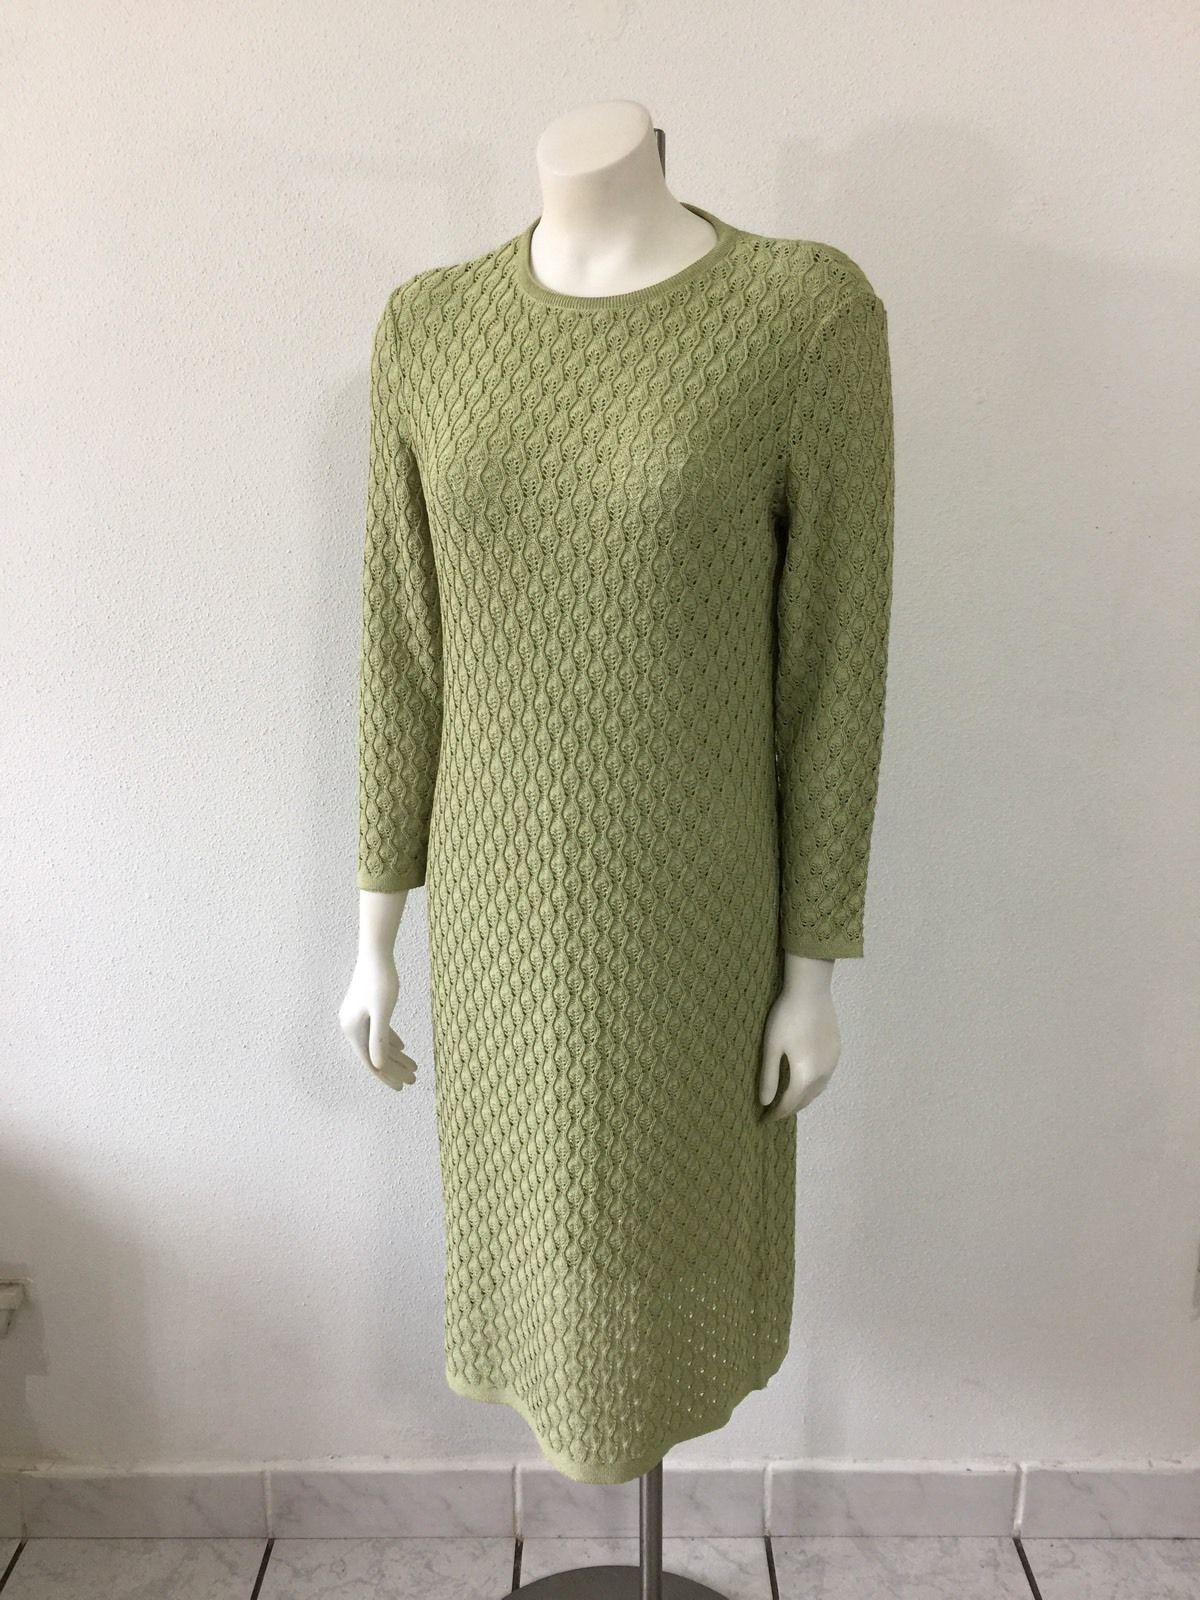 Vintage 1960s 60s Sweater Dress Kimberly Yarn Open Knit Light Green Mod Go Go | eBay